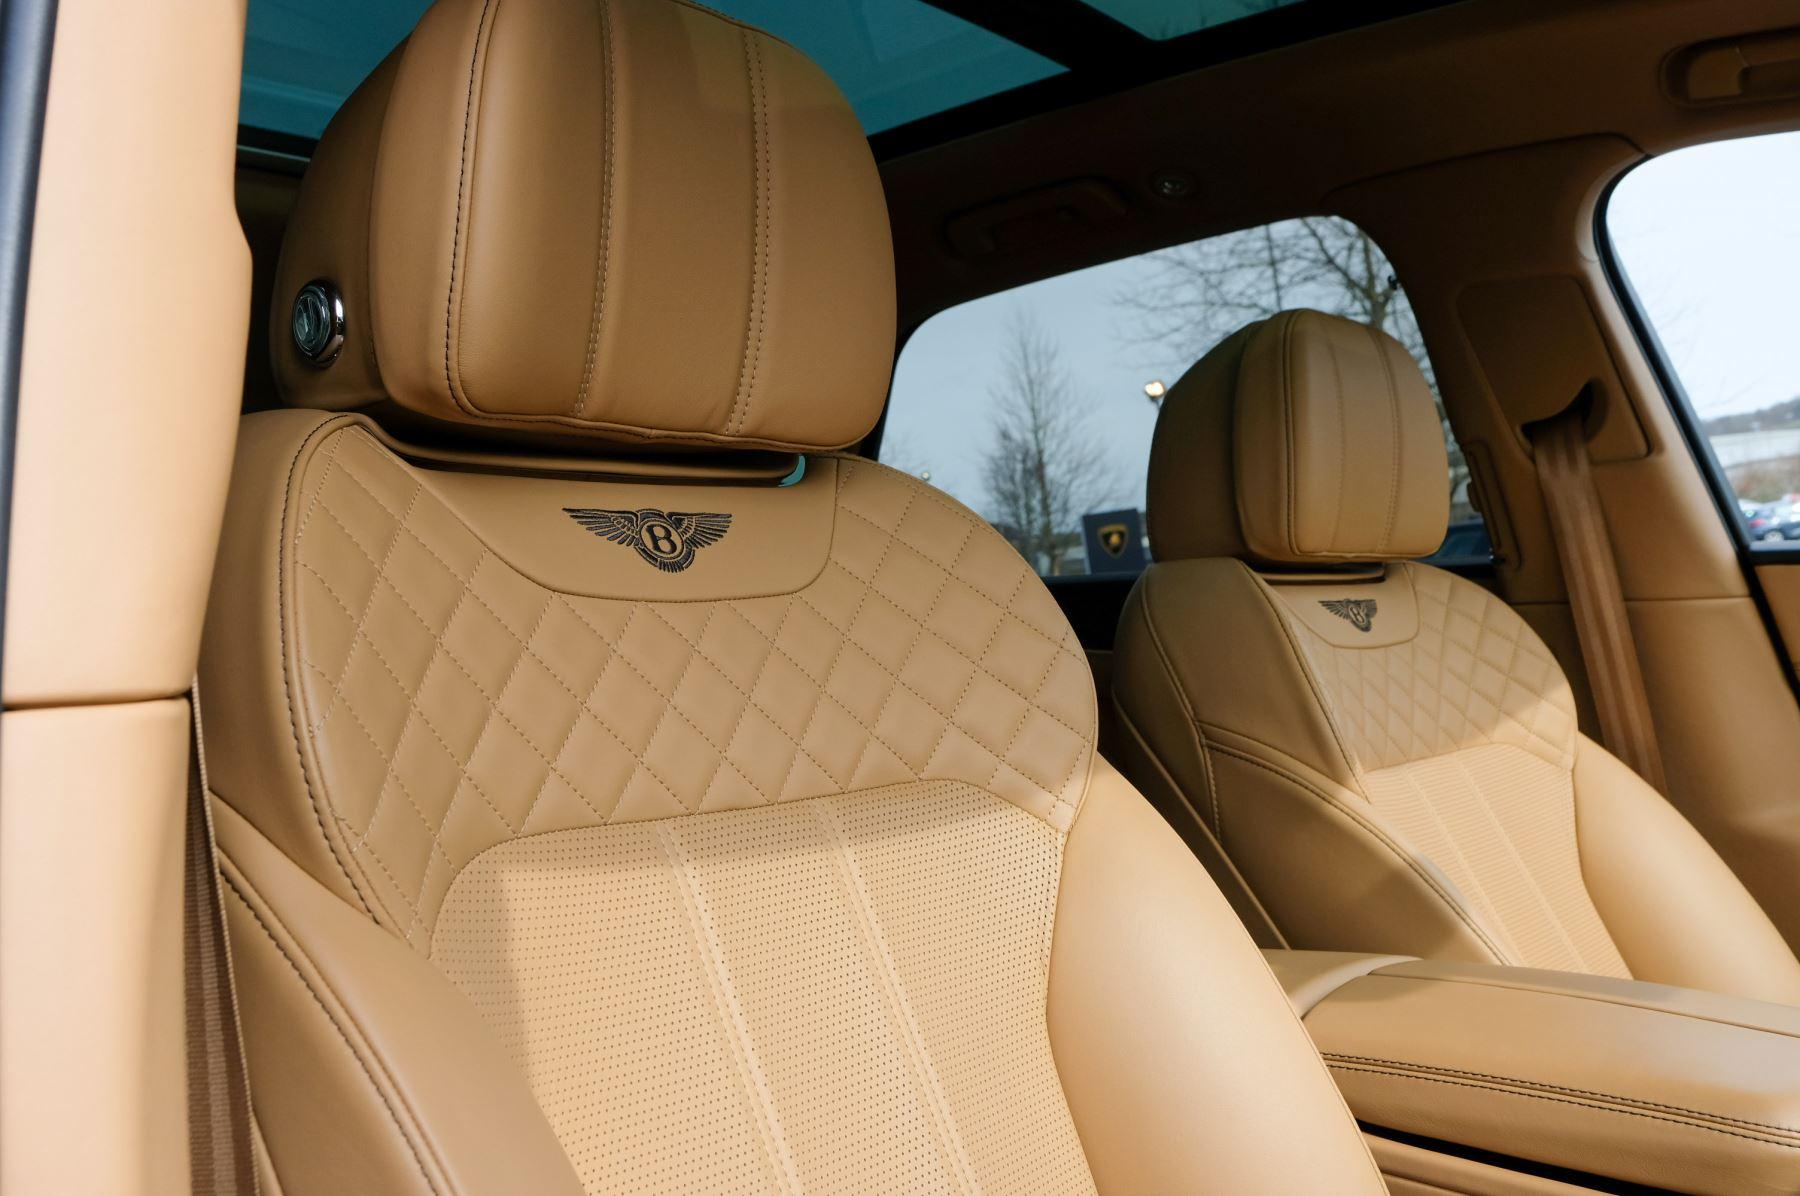 Bentley Bentayga 6.0 W12 5dr - Mulliner Driving Specification  image 28